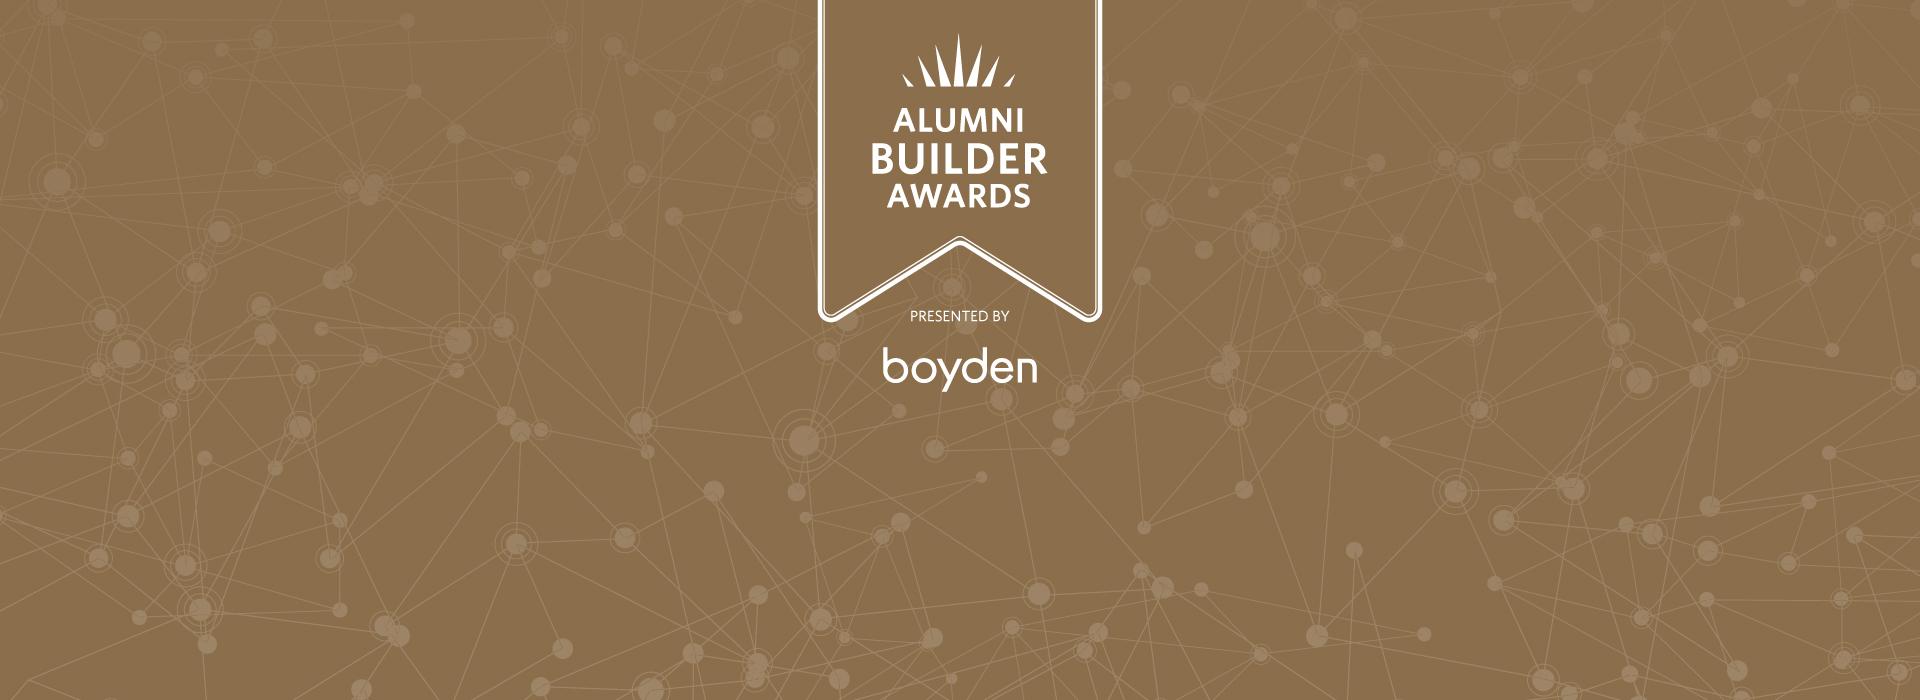 Announcing the 2020-21 Alumni Builder Award recipients